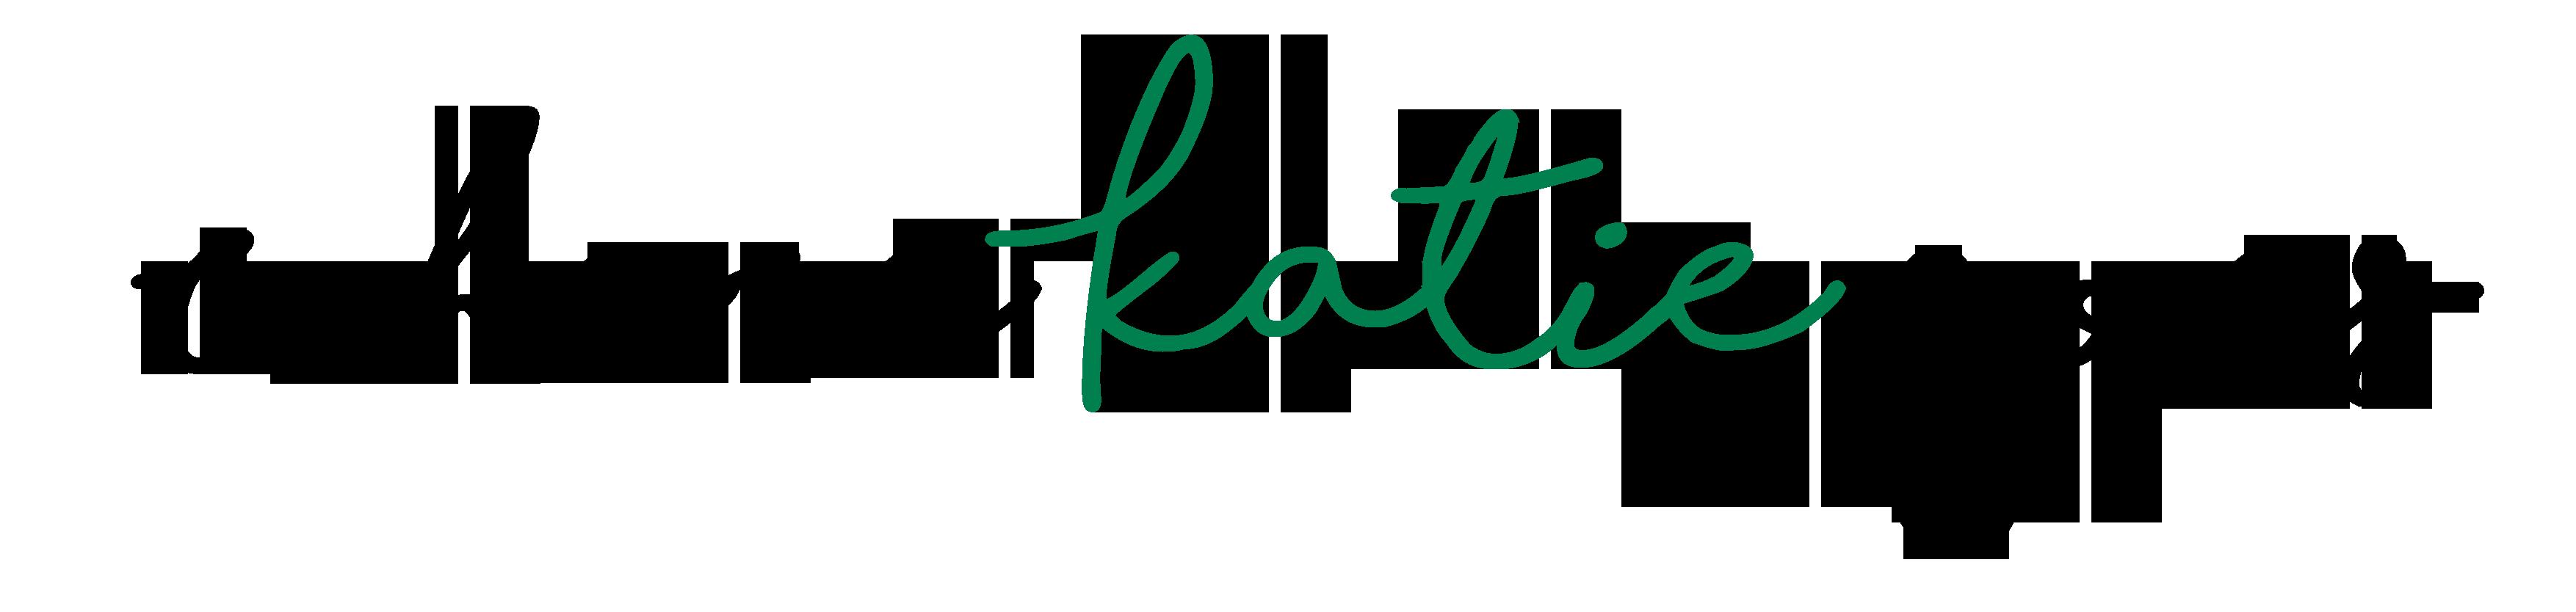 logo-font